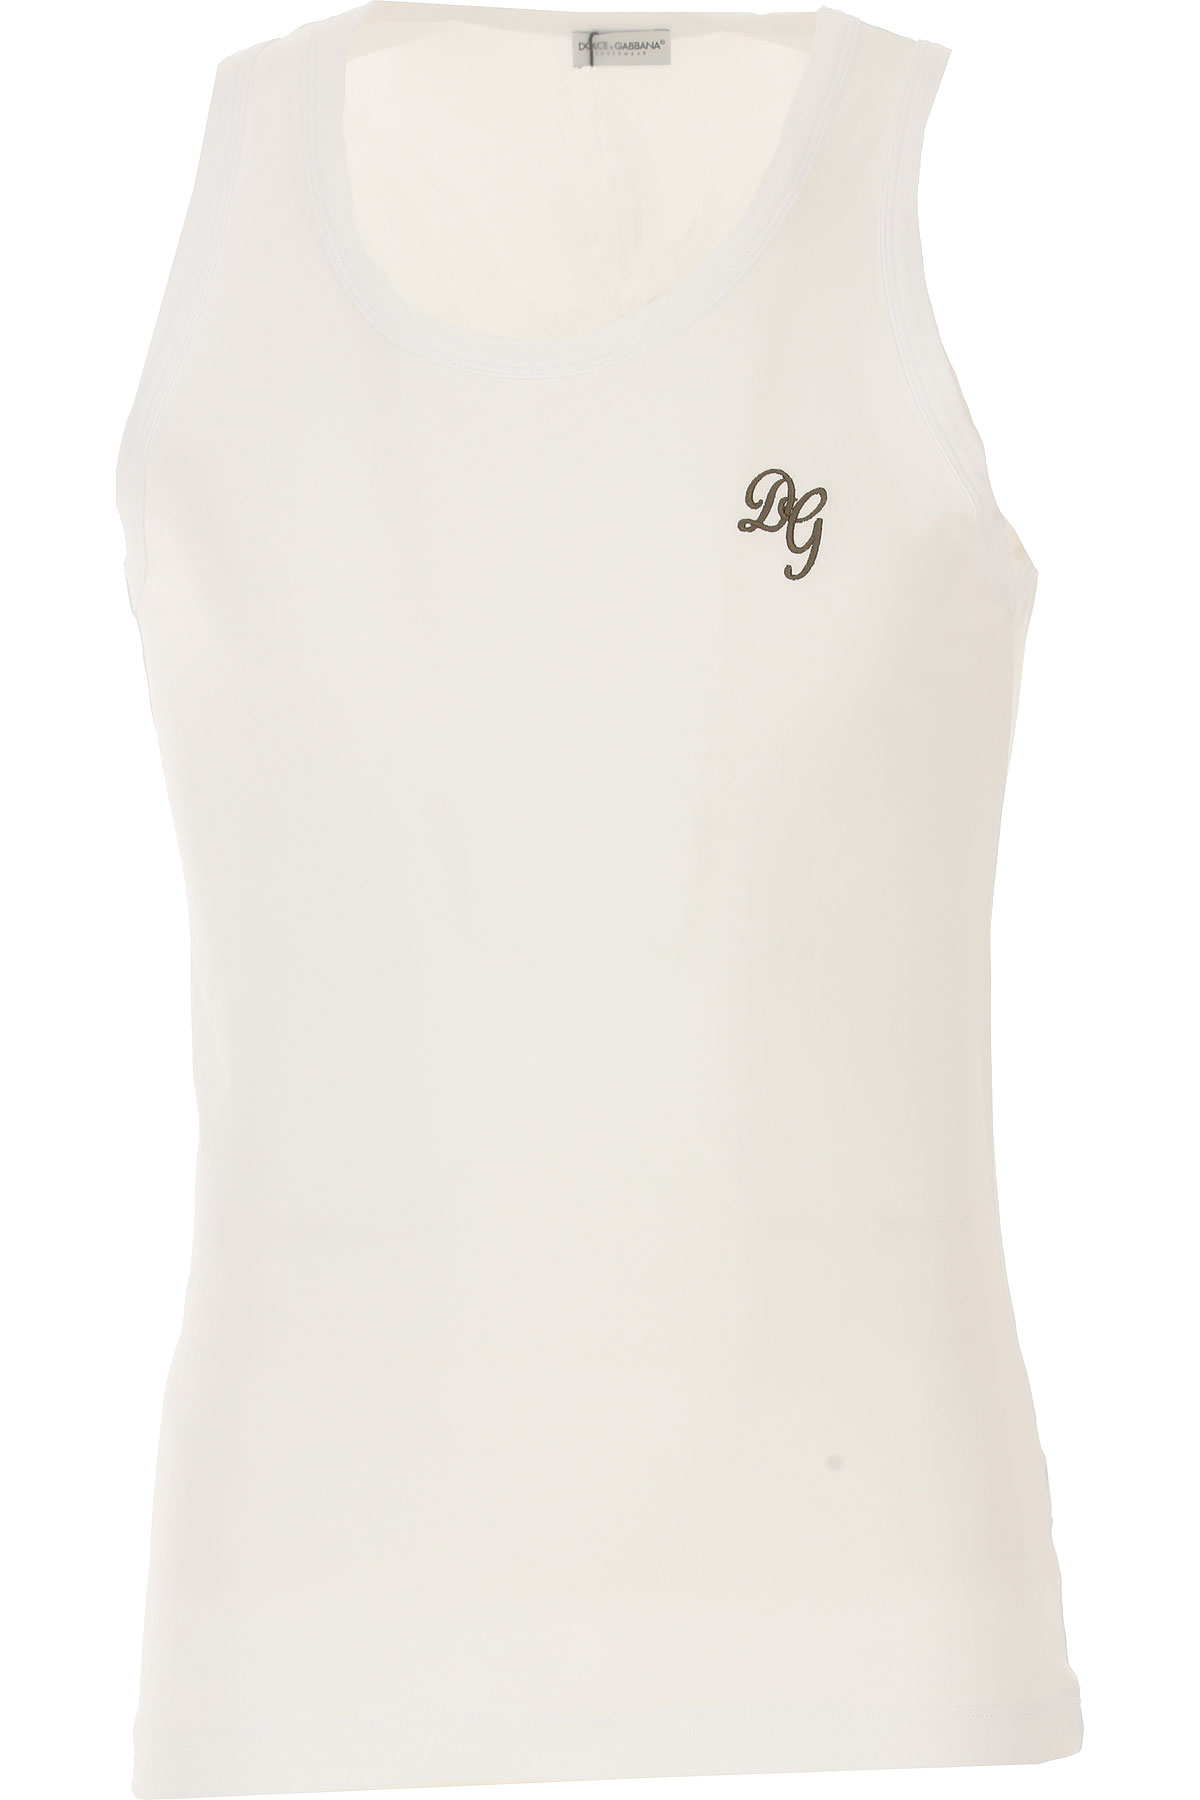 Image of Dolce & Gabbana Tank Top for Men, White, Cotton, 2017, S (EU 3) M (EU 4) L (EU 5) XL (EU 6)